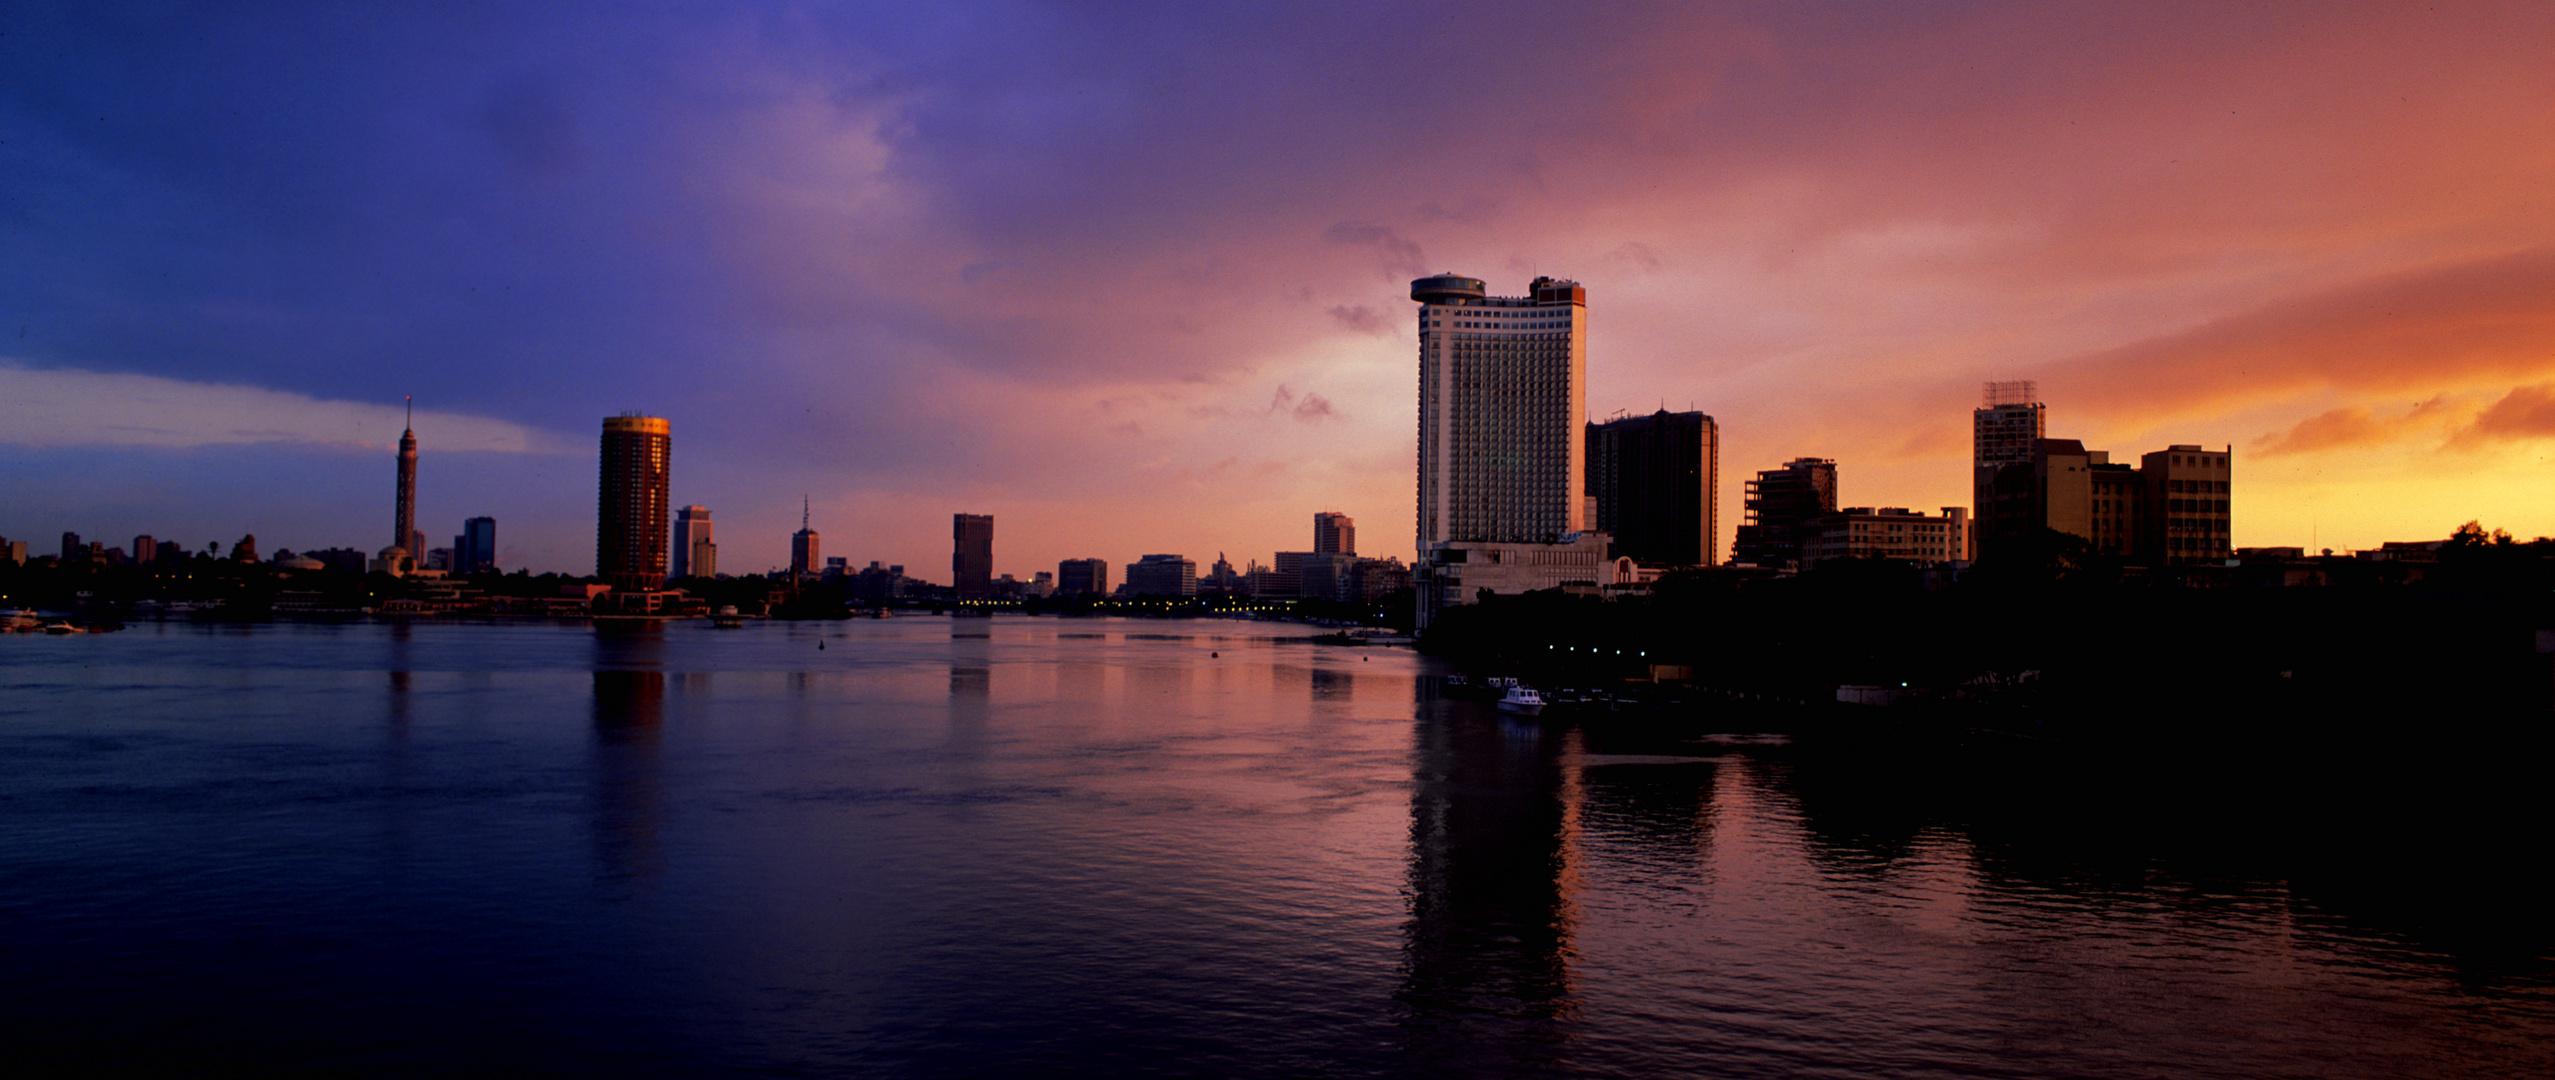 Cairo - Nil